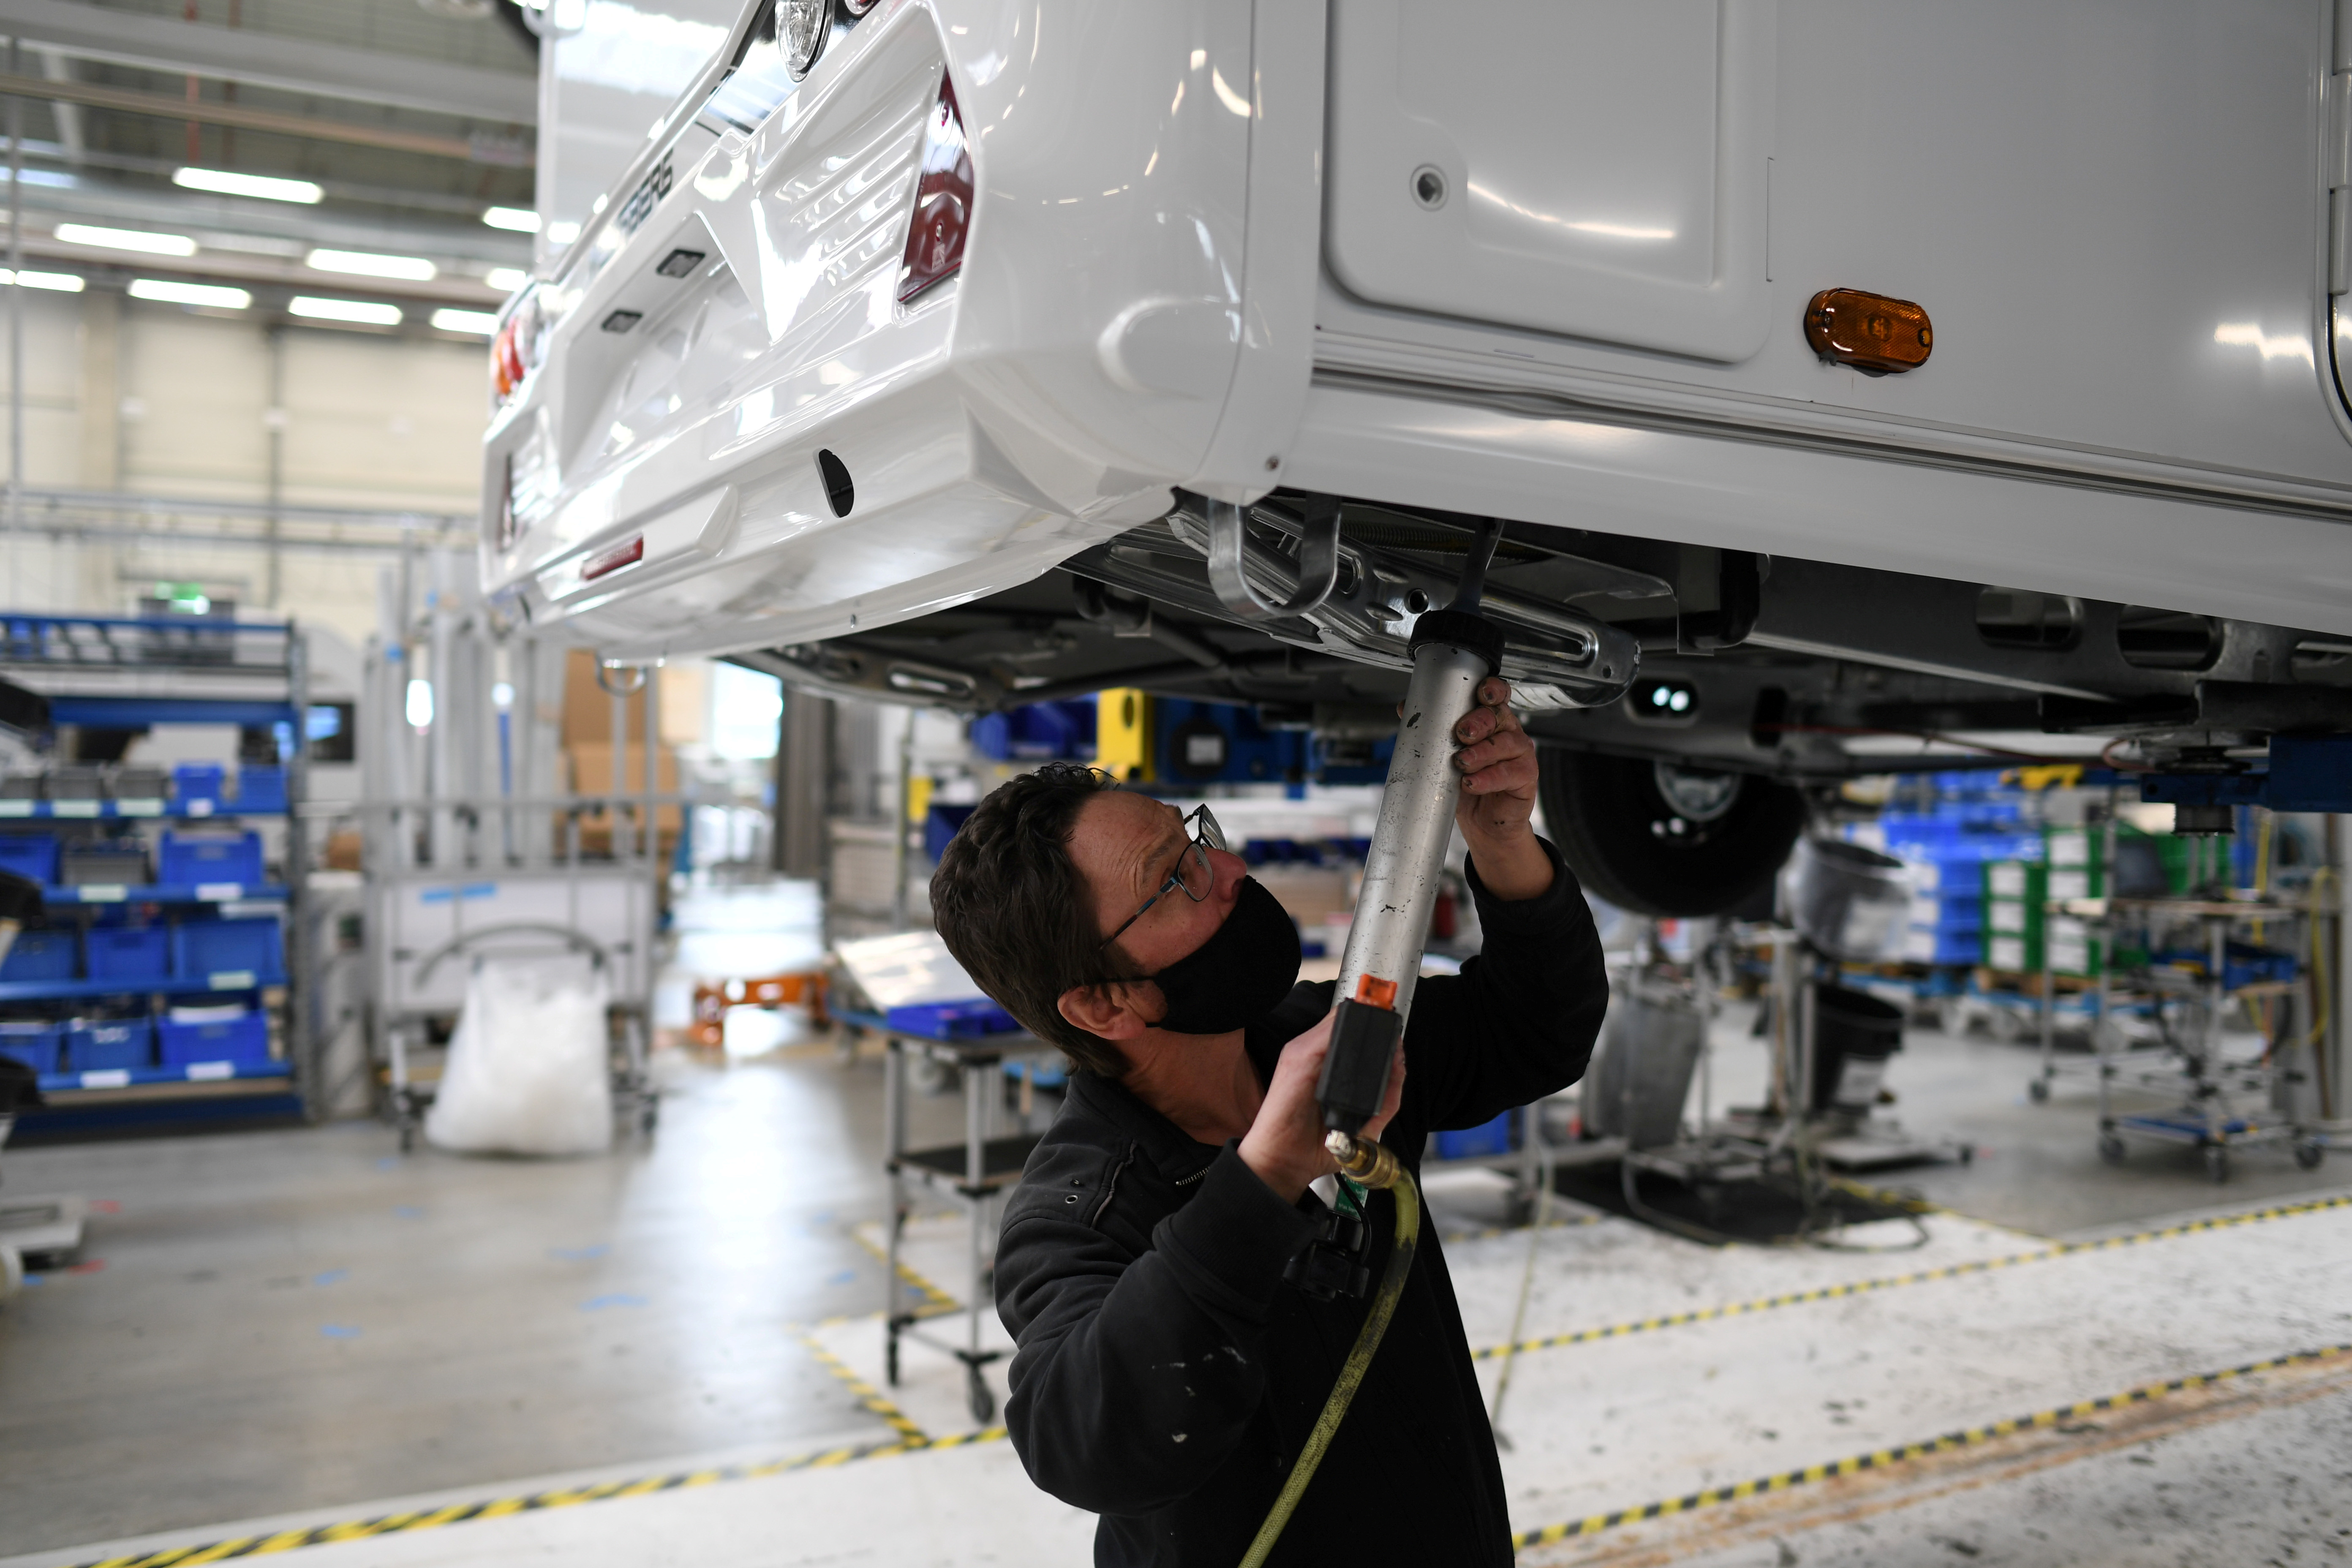 A worker assembles a vehicle at the Knaus-Tabbert AG factory in Jandelsbrunn near Passau, Germany, March 16, 2021. REUTERS/Andreas Gebert